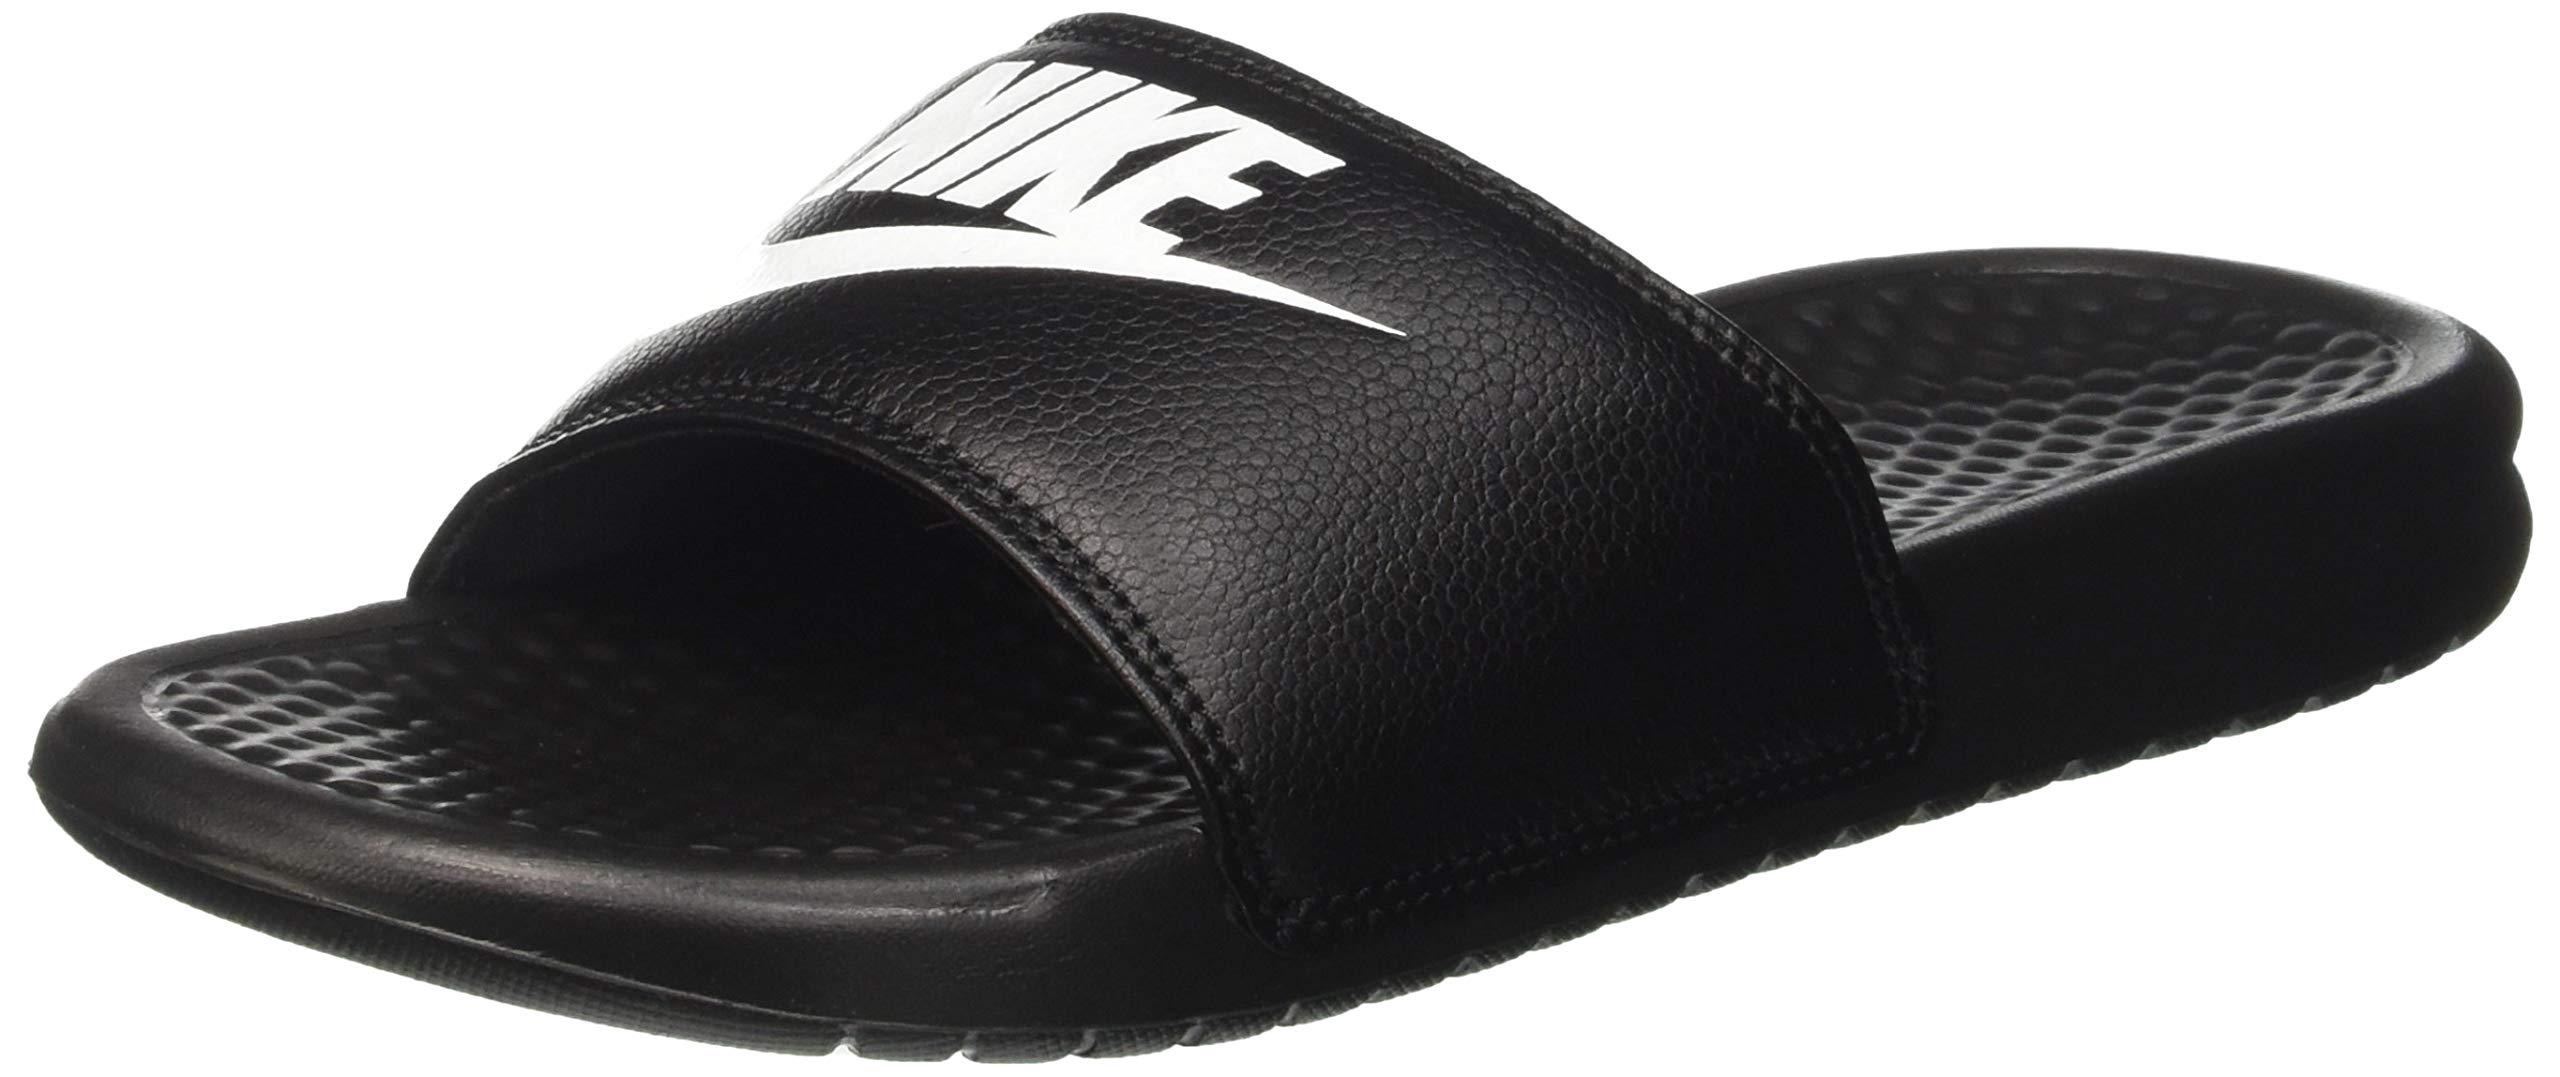 reputable site 50b81 db4ce Galleon - Nike Men s Benassi Just Do It Athletic Sandal, Black White Noir  Blanc, 12.0 Regular US